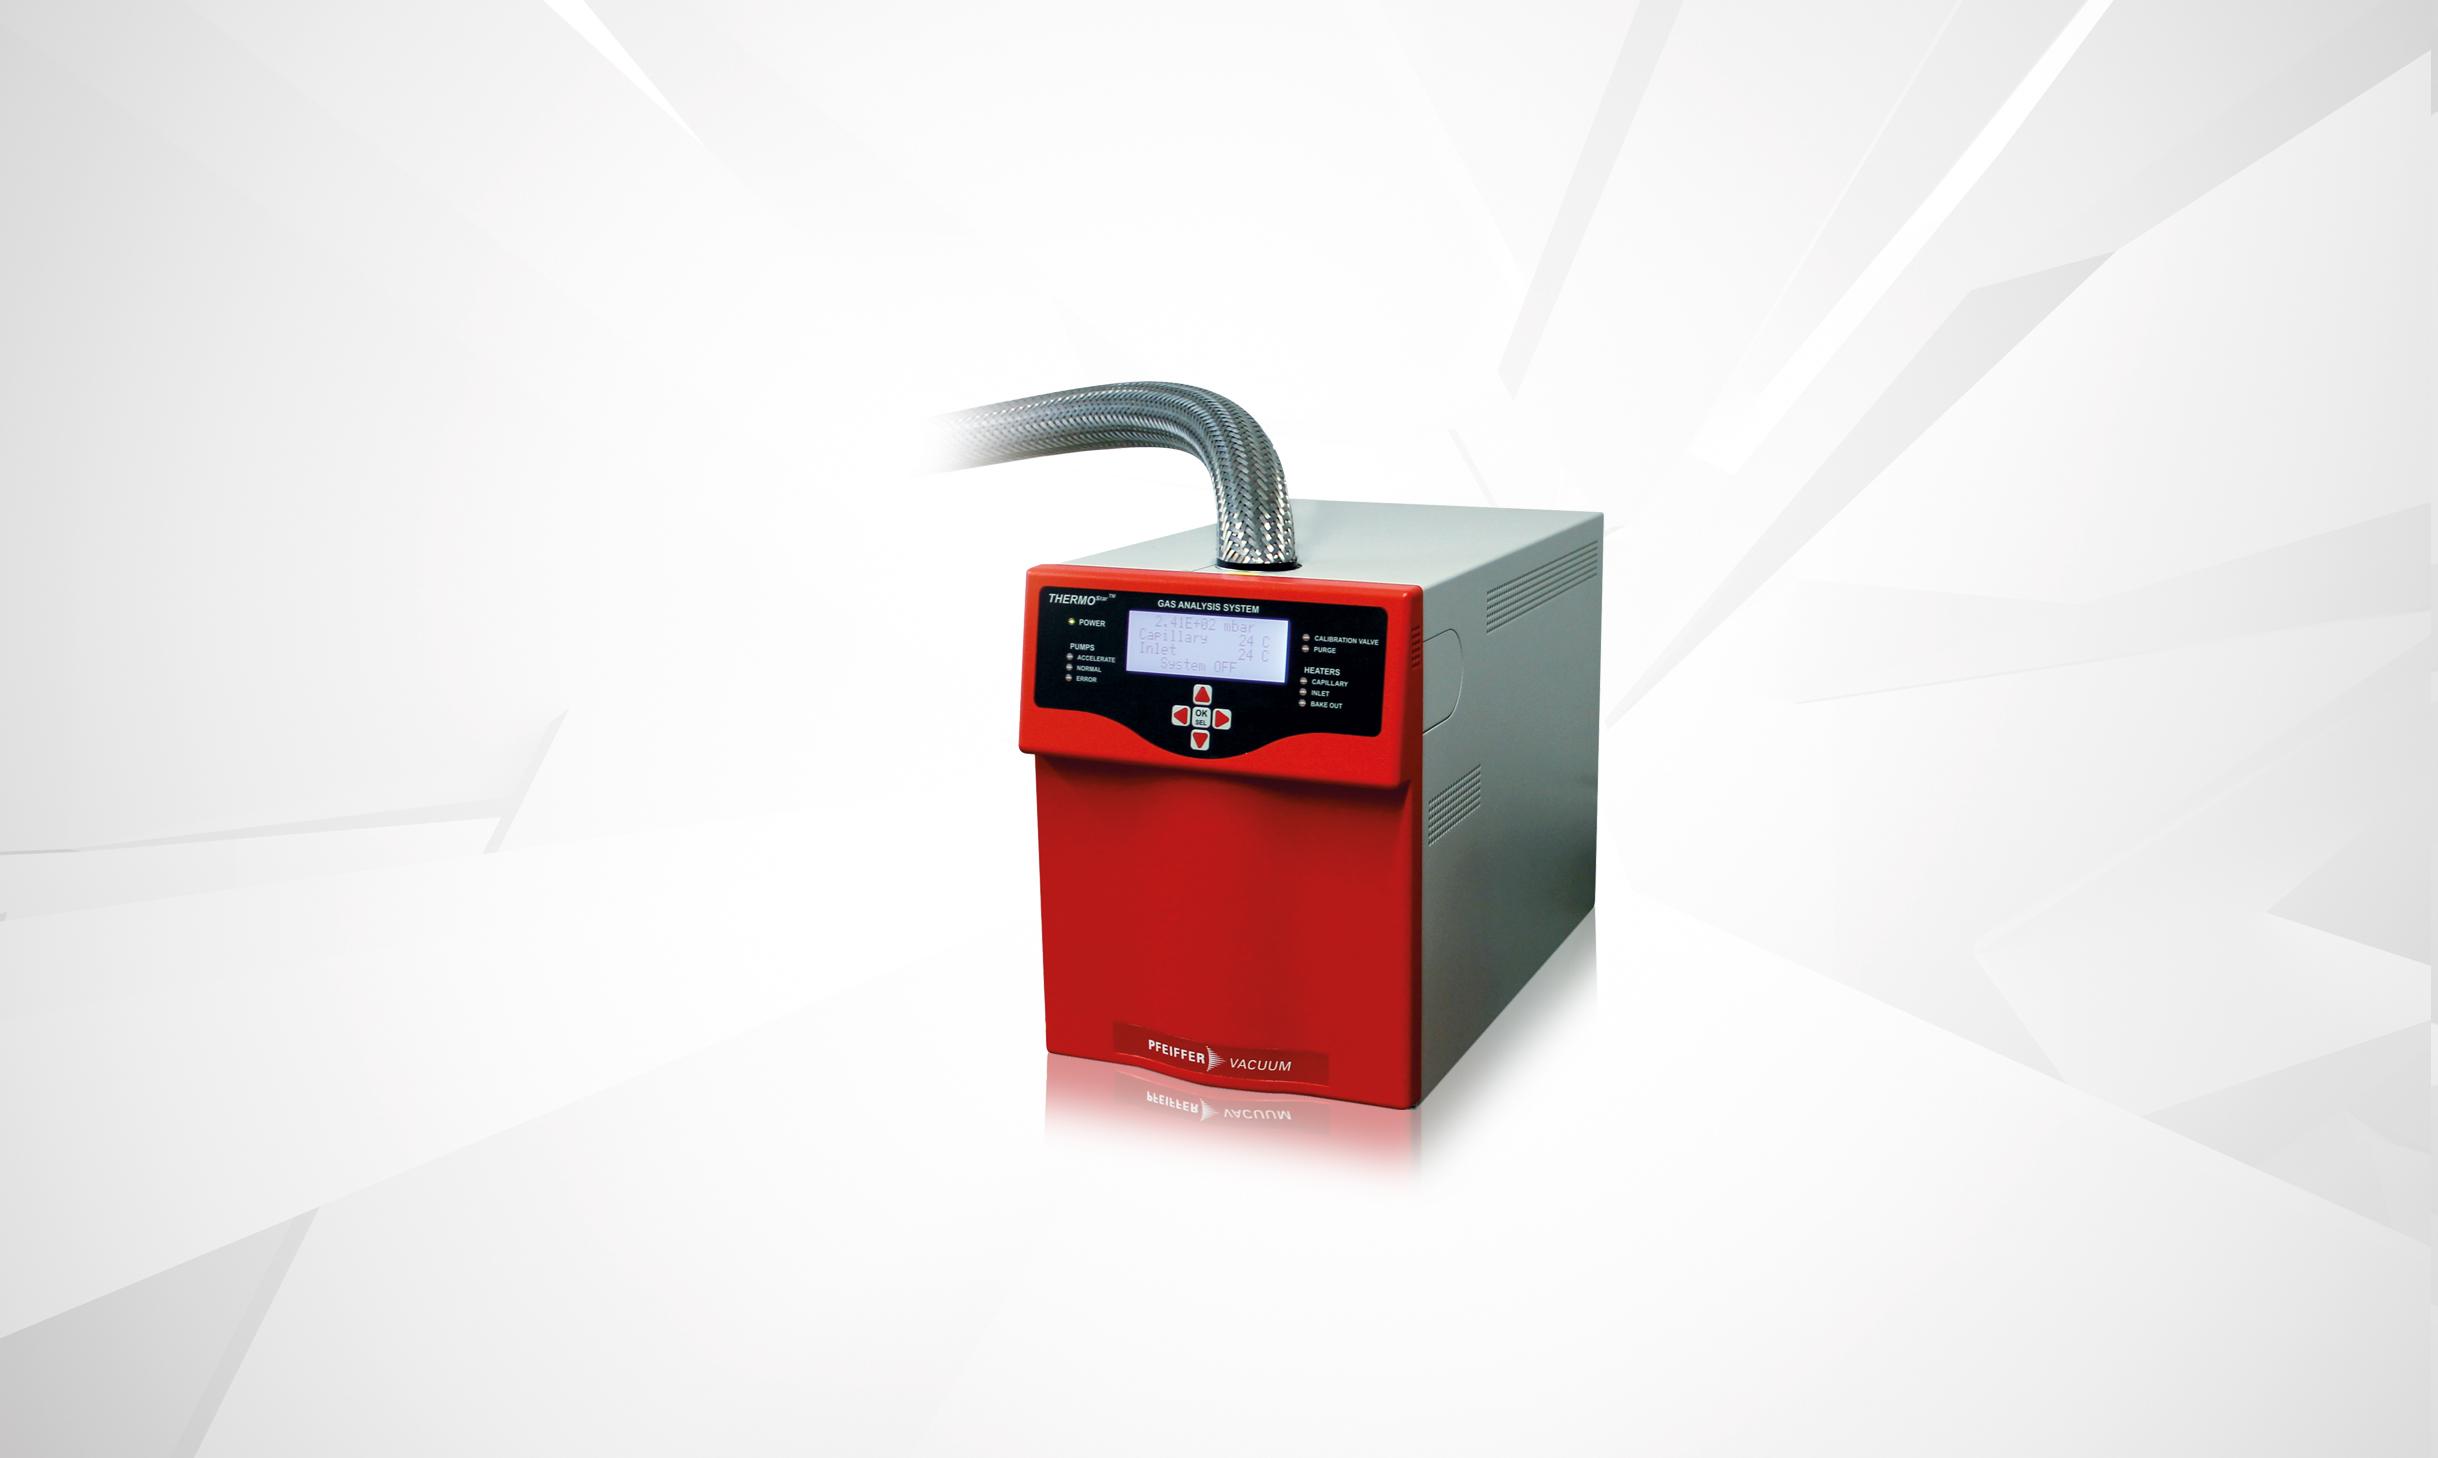 EGA MS - evolved gas analysis - thermal analysis